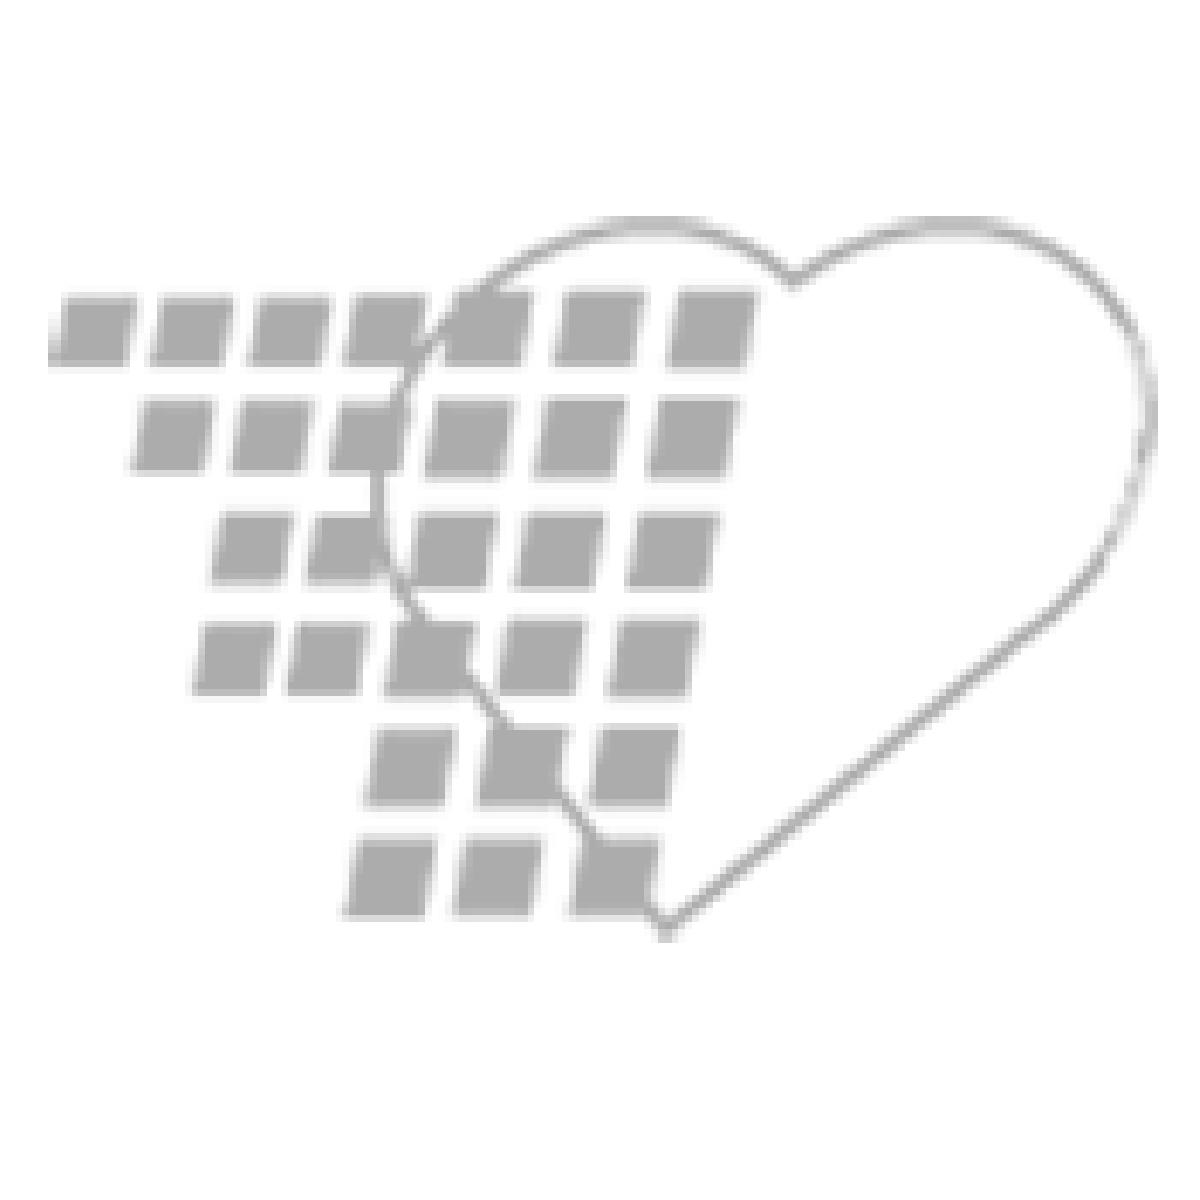 02-65-3707 - Medline Microscope Slides Frosted